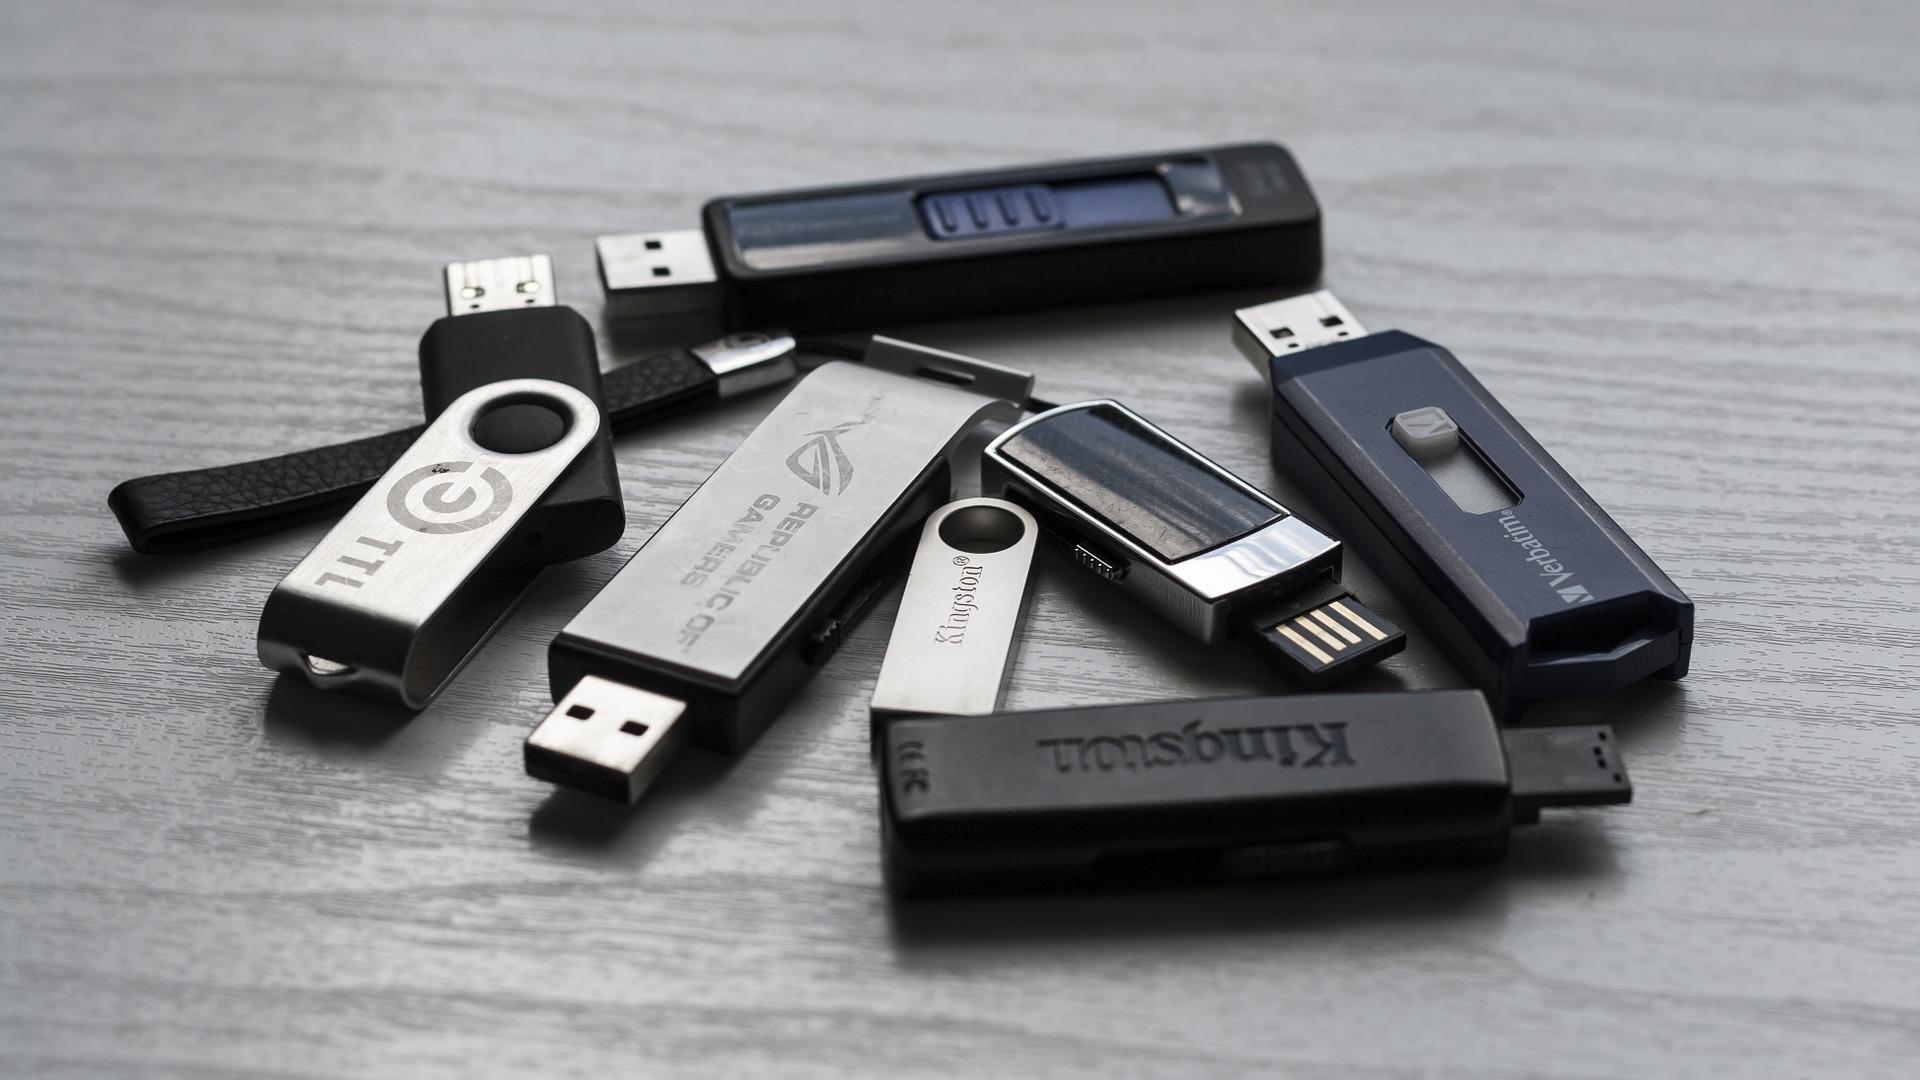 USB stik til lagring og HDMI splittere – Stort udvalg